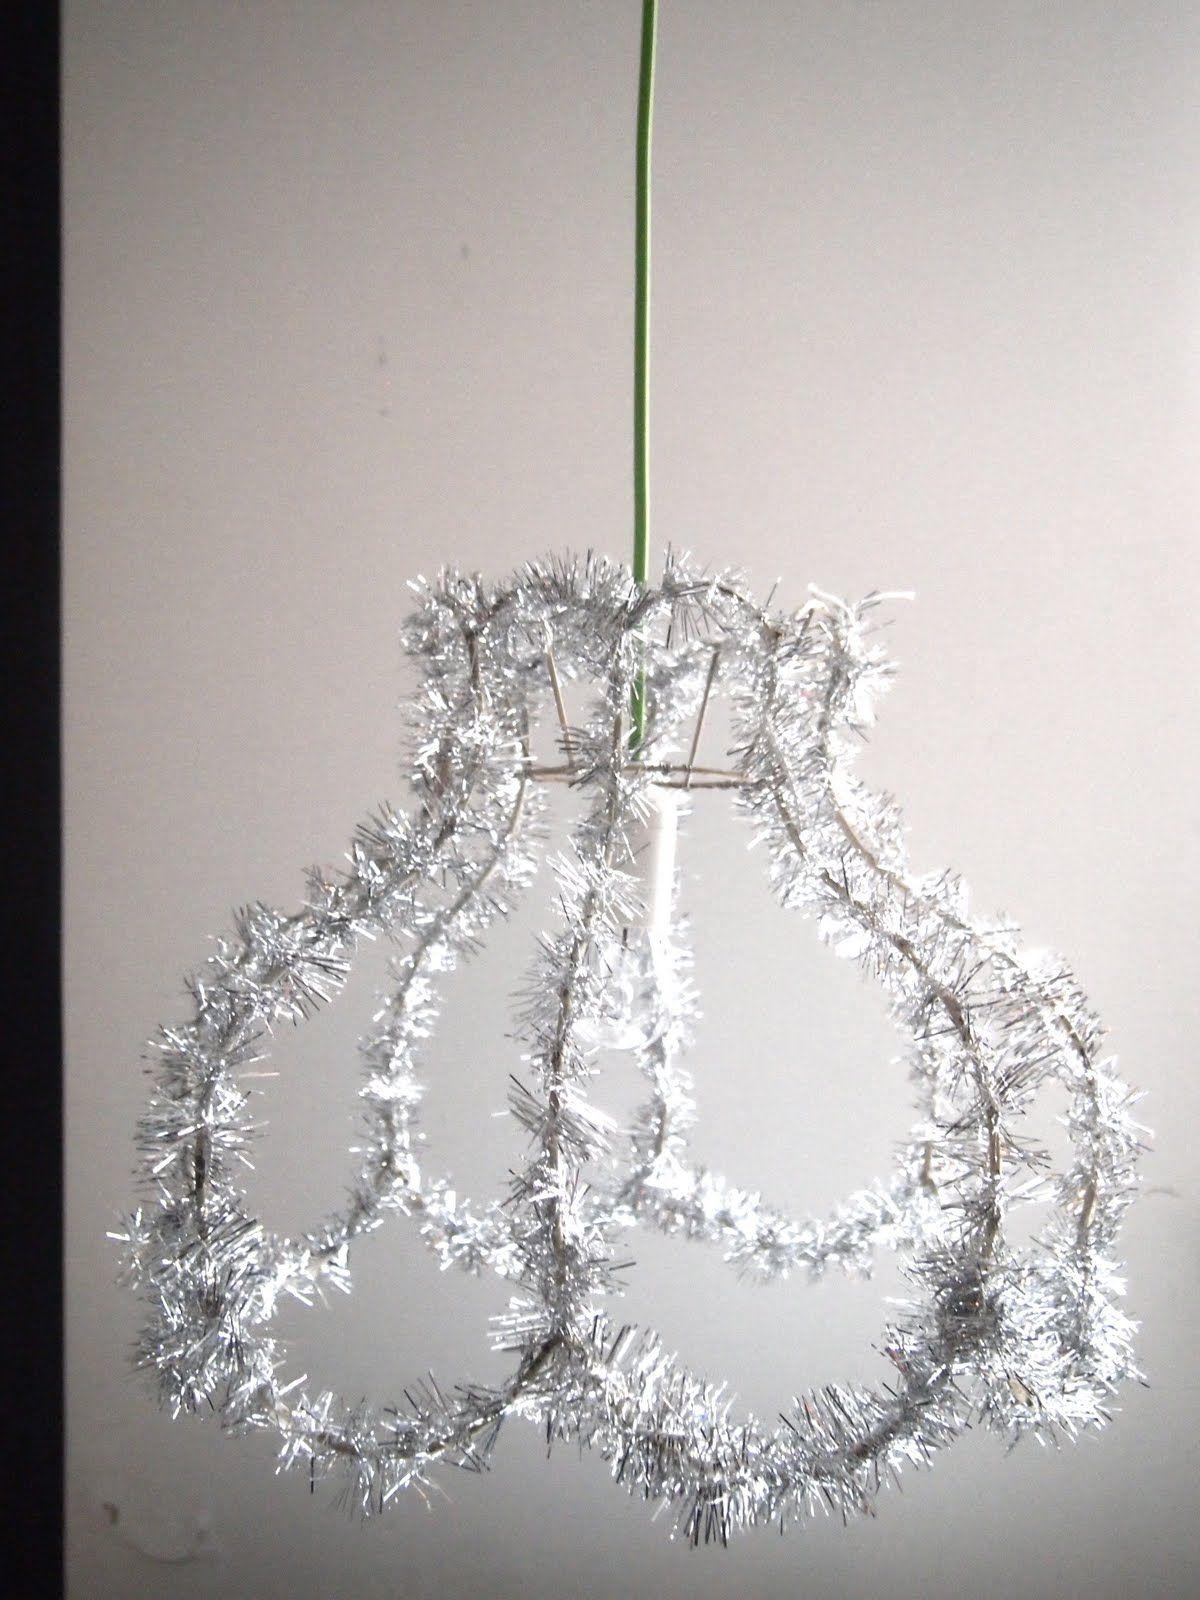 Tinsel lamp shade christmas decor pinterest lamp ideas tinsel lamp shade xmas idea around store aloadofball Gallery